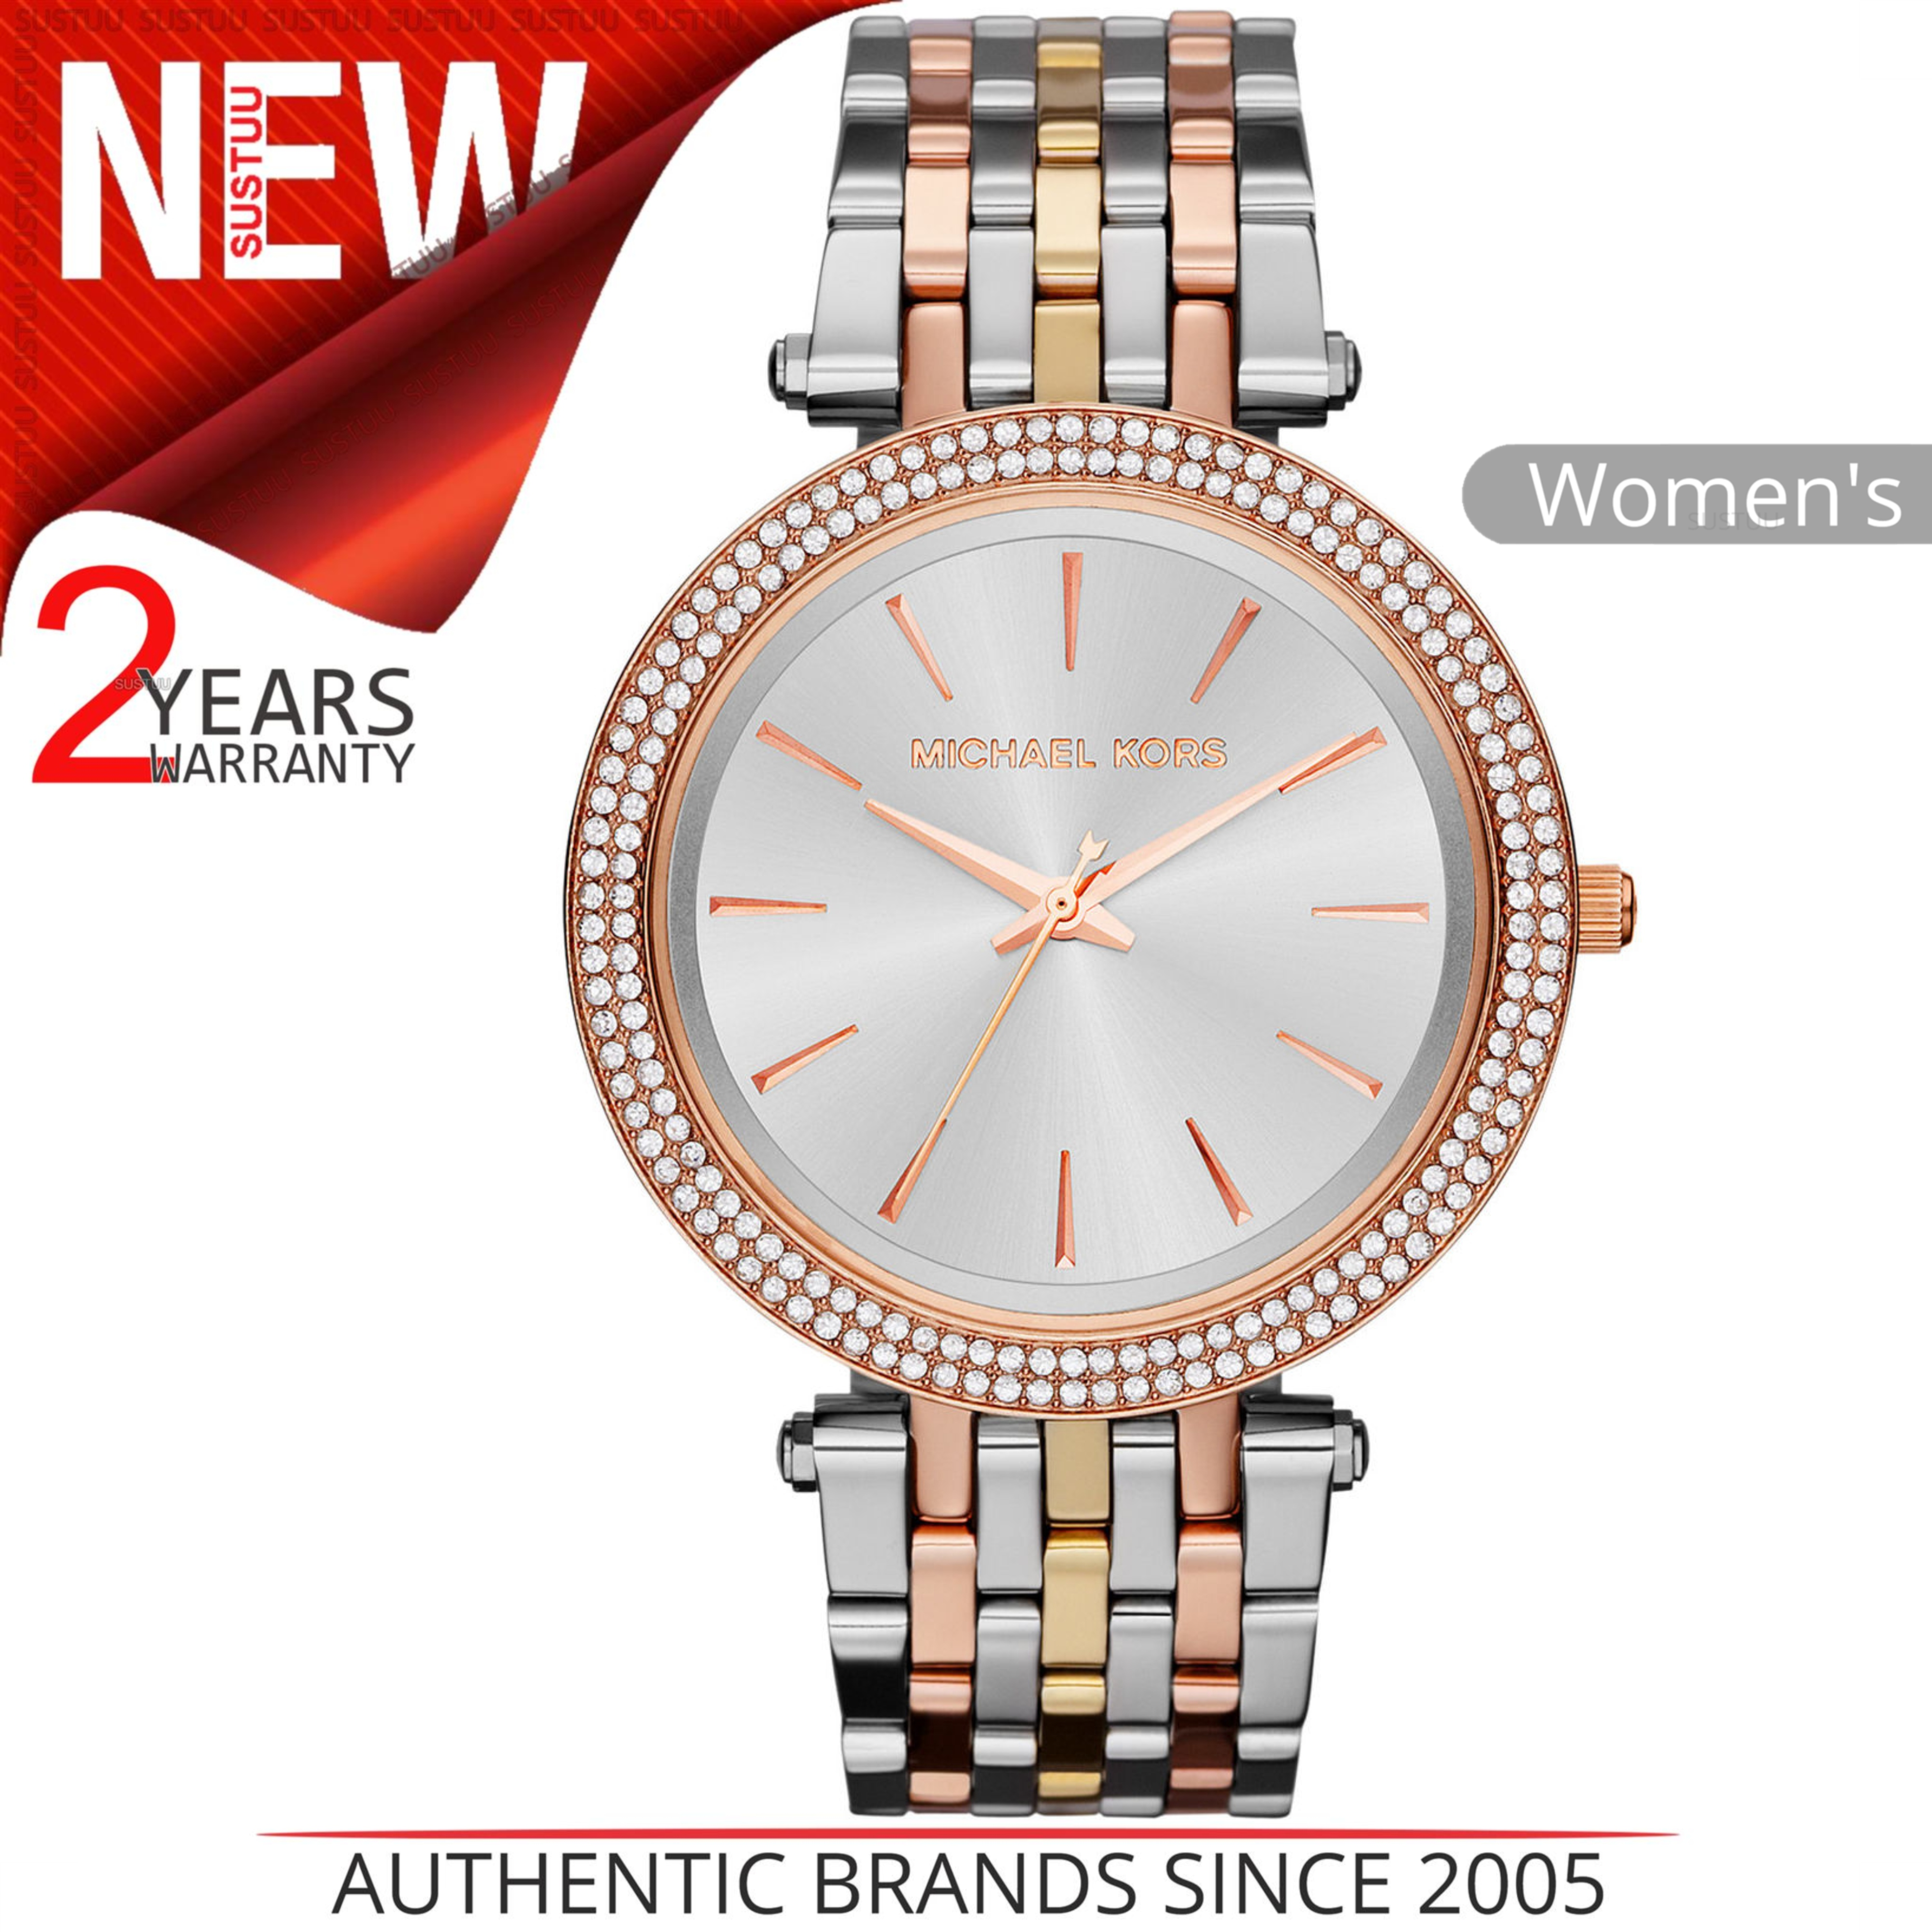 aa643d8f6ad8 Details about Michael Kors Darci Ladies Watch│Round Silver Dial│Tri Tone  Bracelet Strap│MK3203